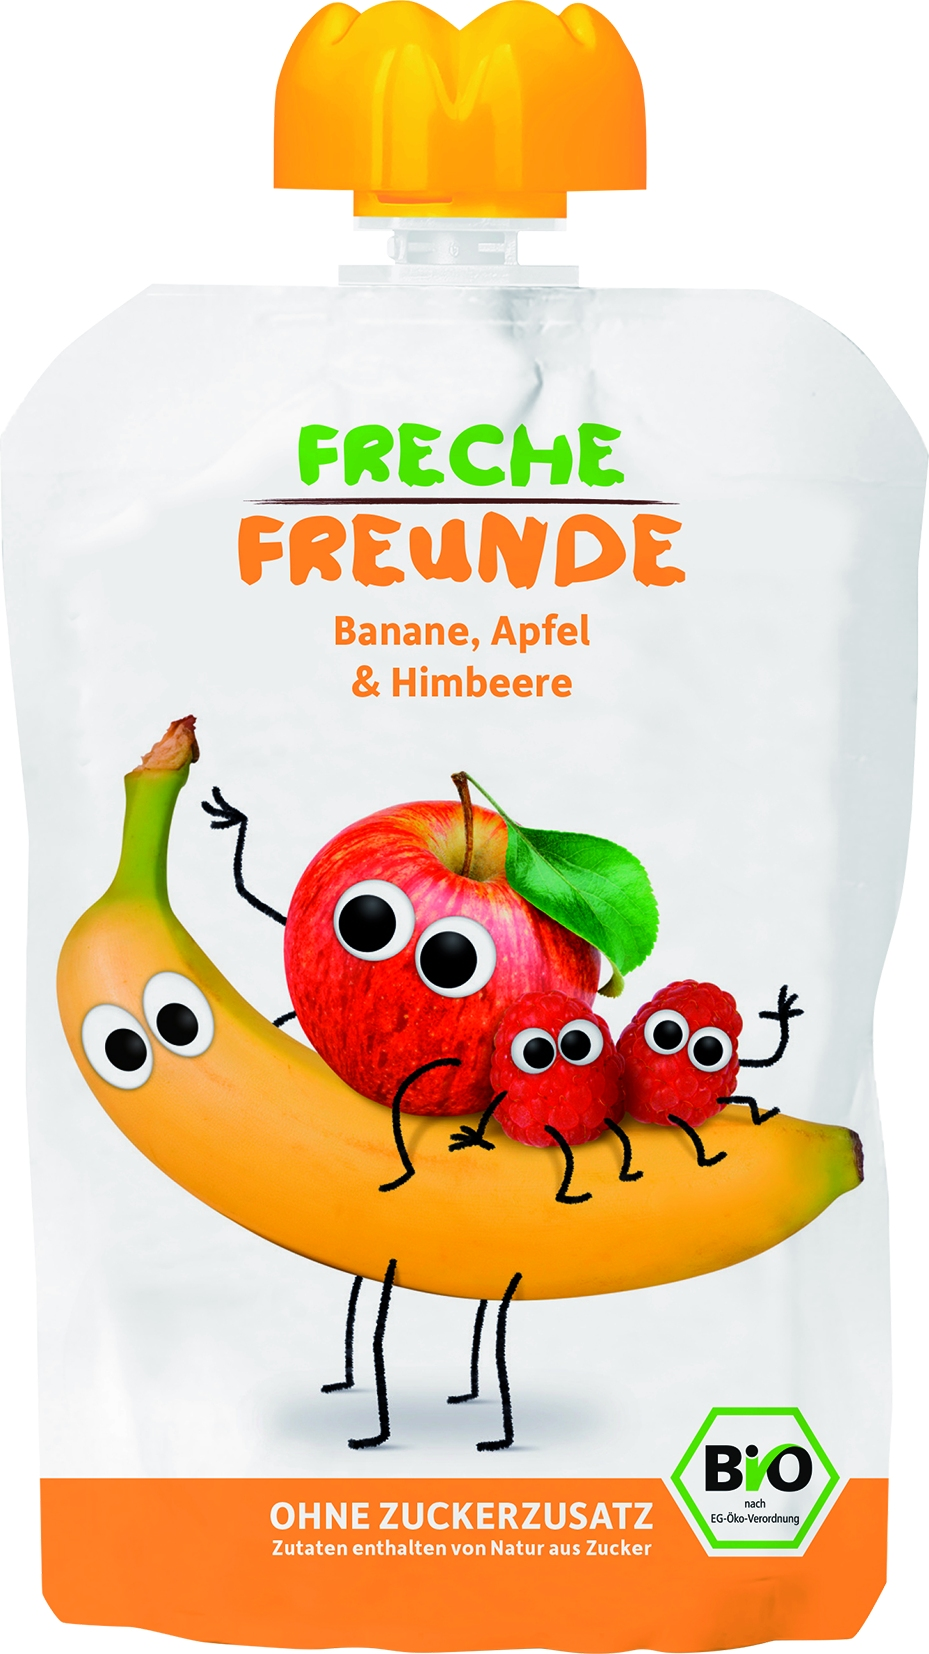 Freche Freunde - Apfel /Banane /Himbeer